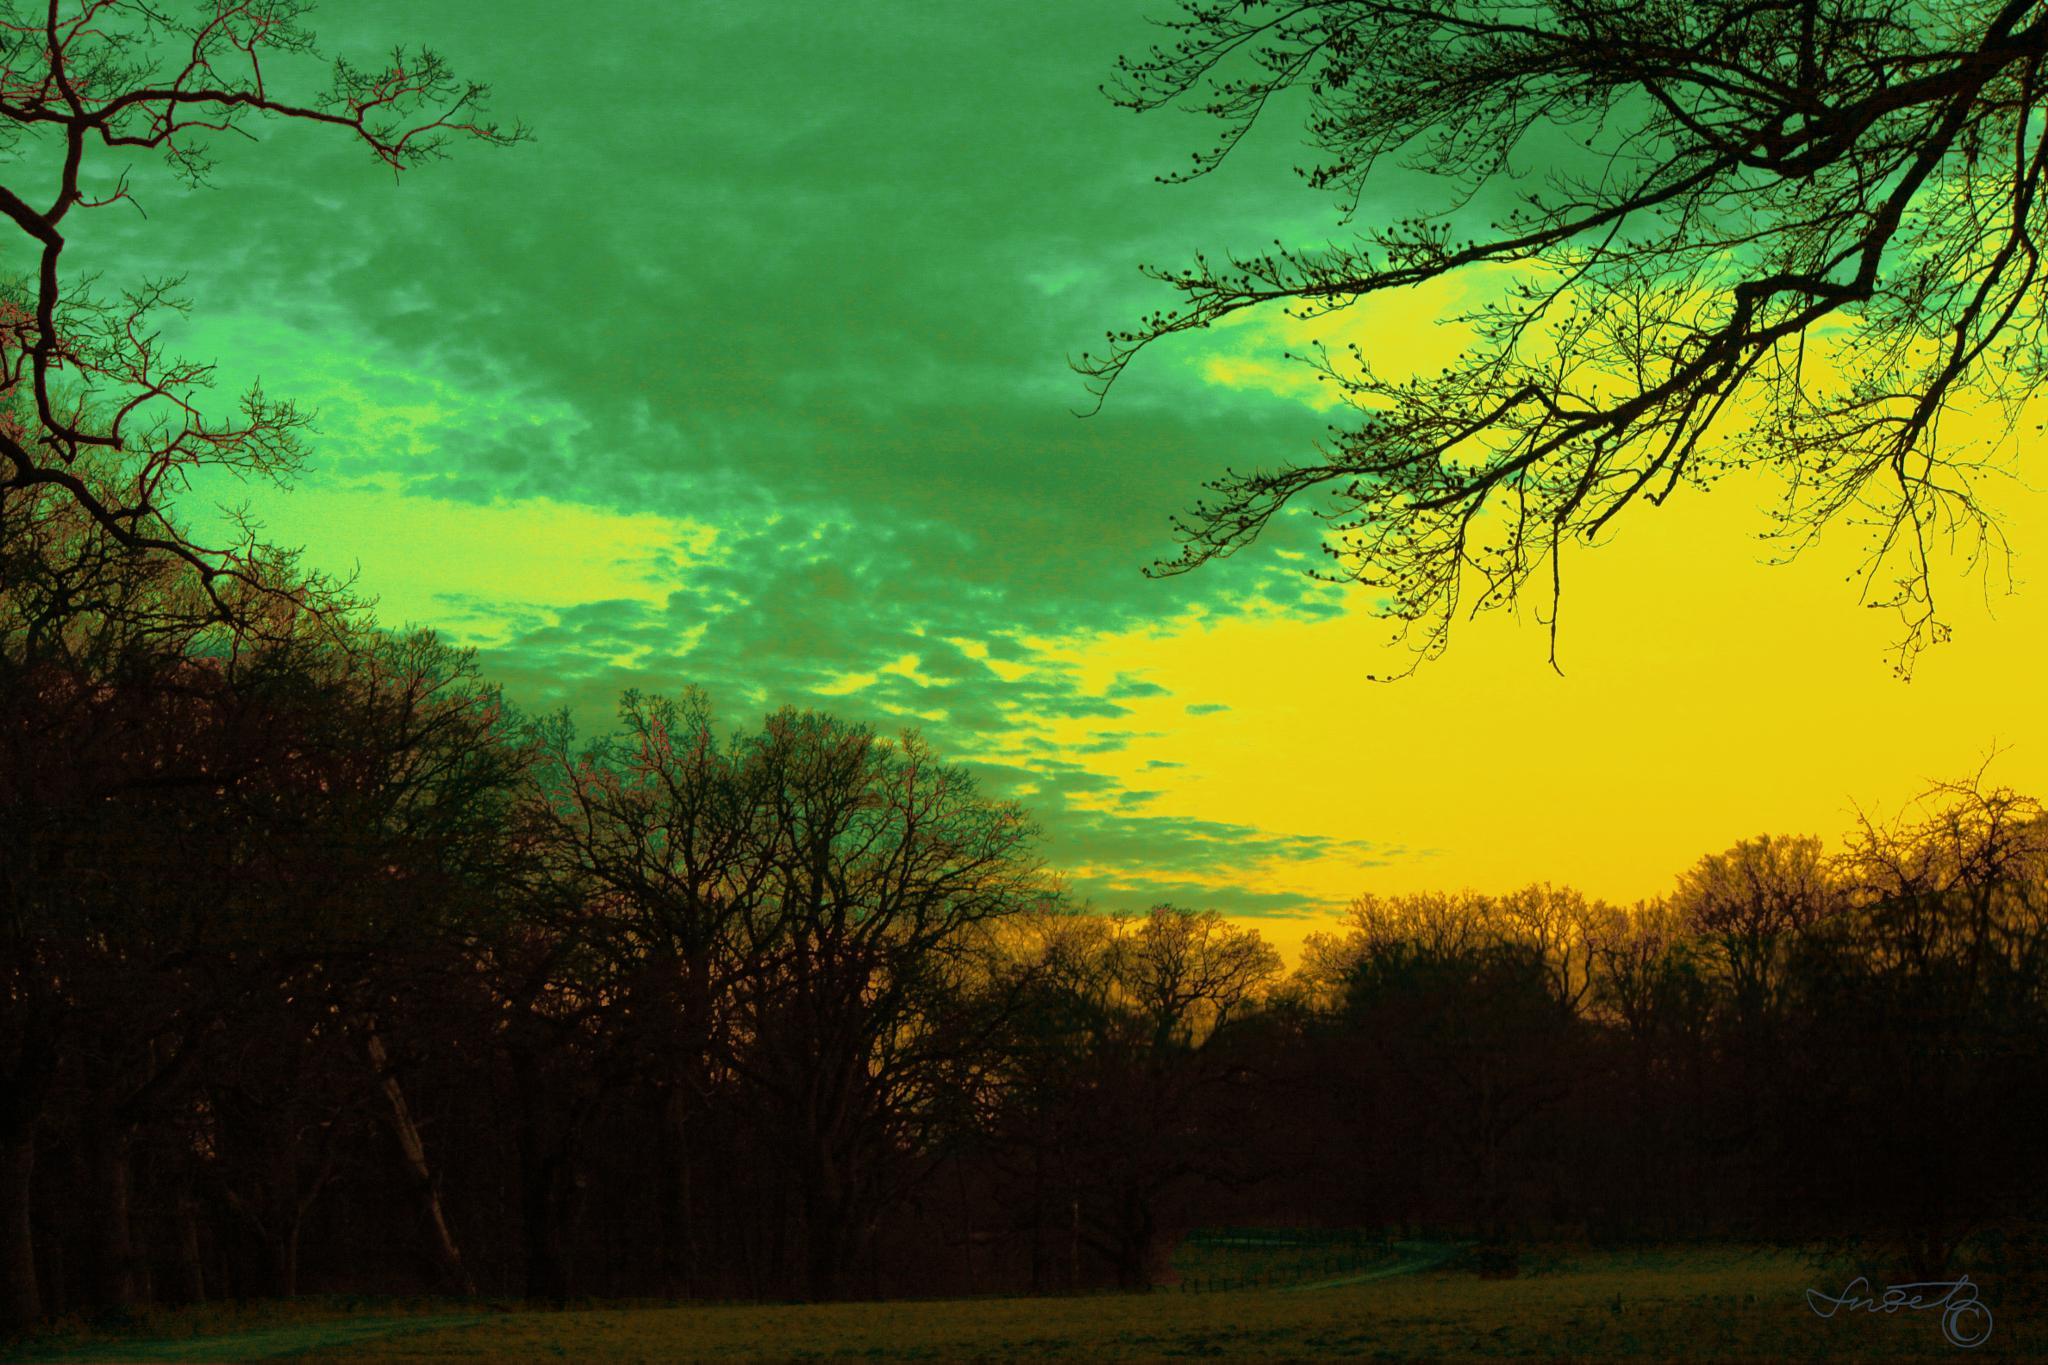 Evening serenity II by snezana.lindskog